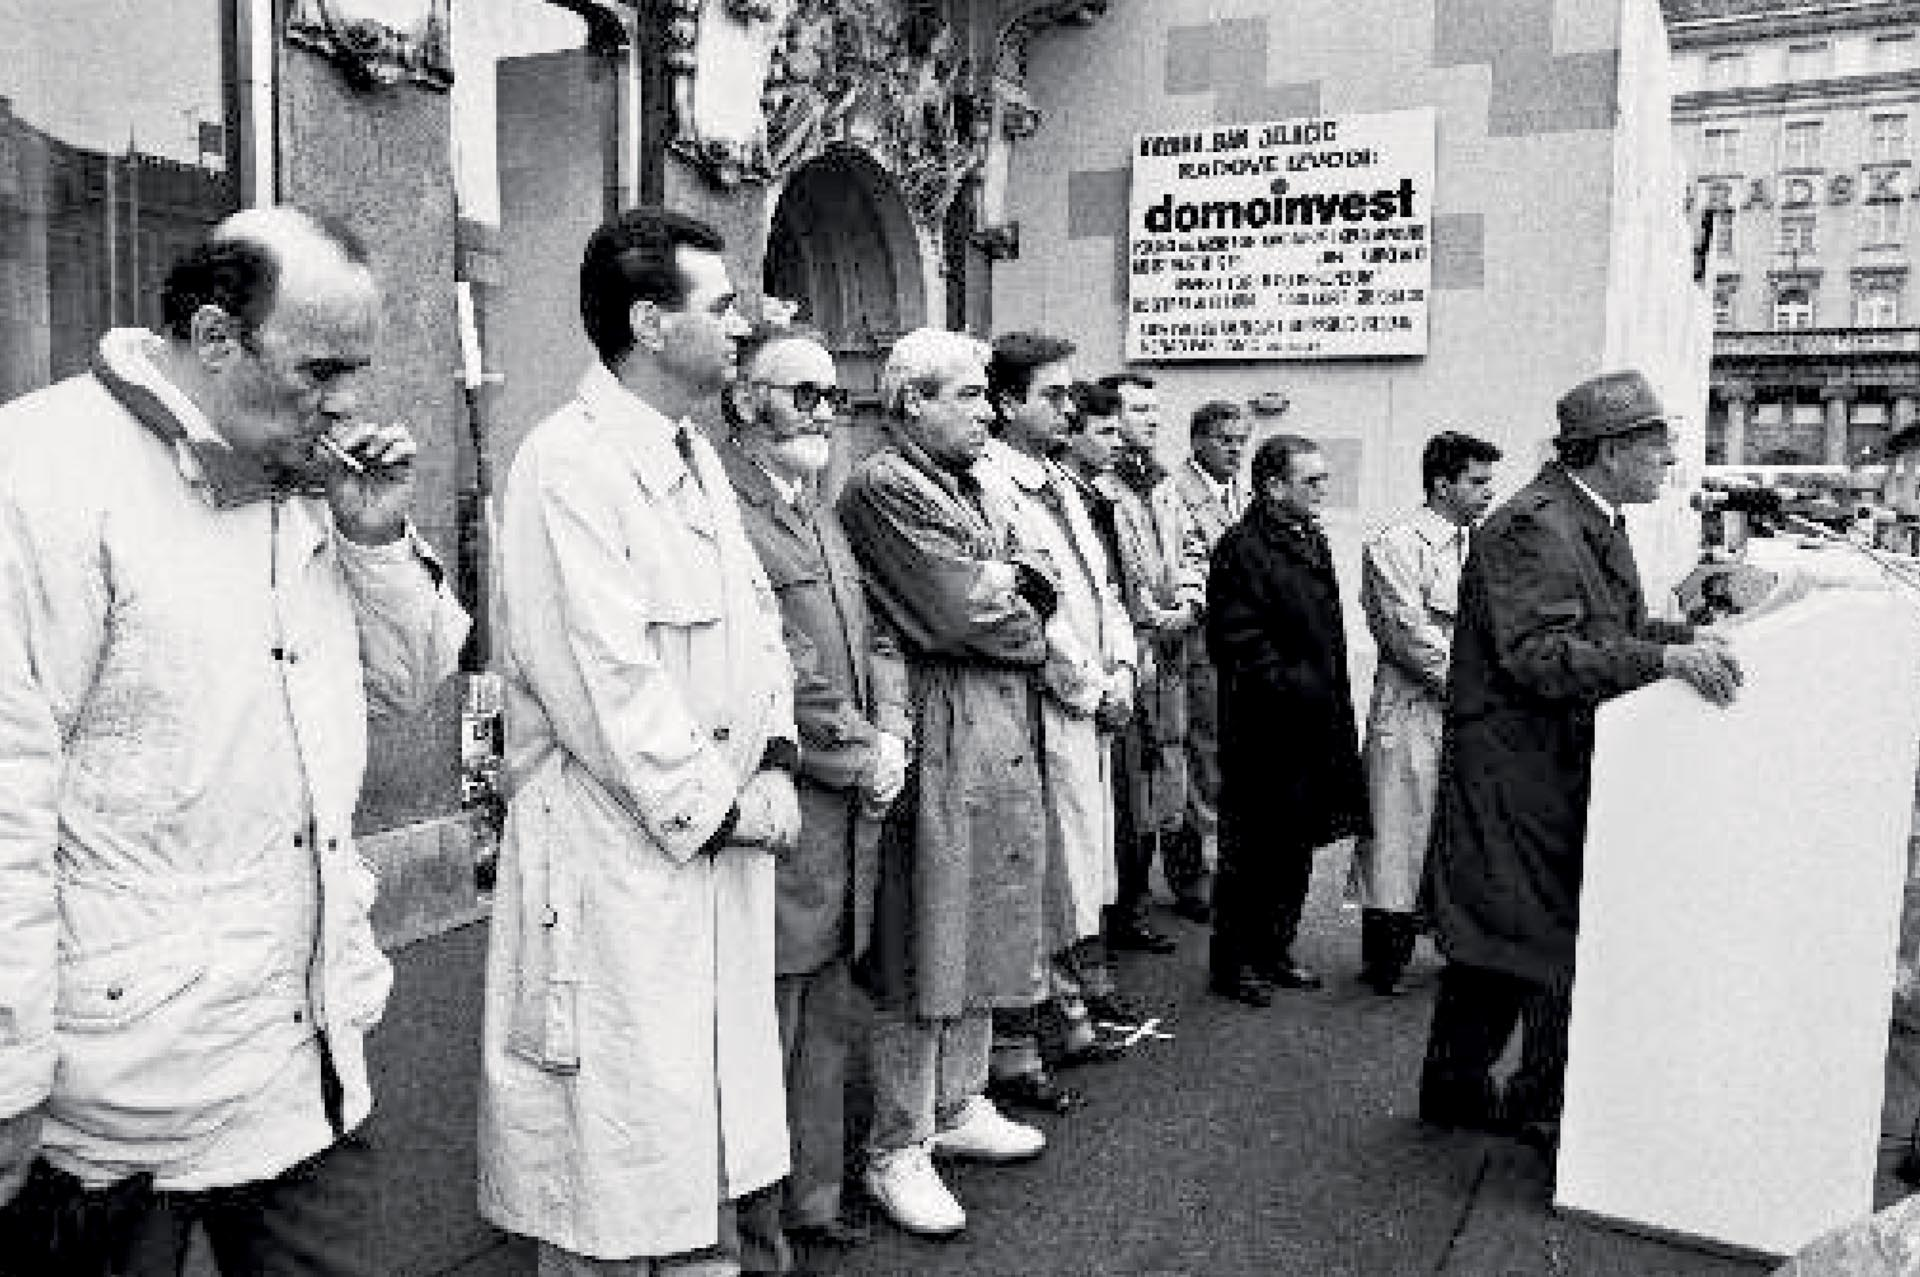 GOVORNICI IZ NOVOOSNOVANIH DEMOKRATSKIH STRANAKA NA SKUPU 1990. GODINE | Foto: IZLOŽBA '120 GODINA HRVATSKE SOCIJALDEMOKRACIJE'